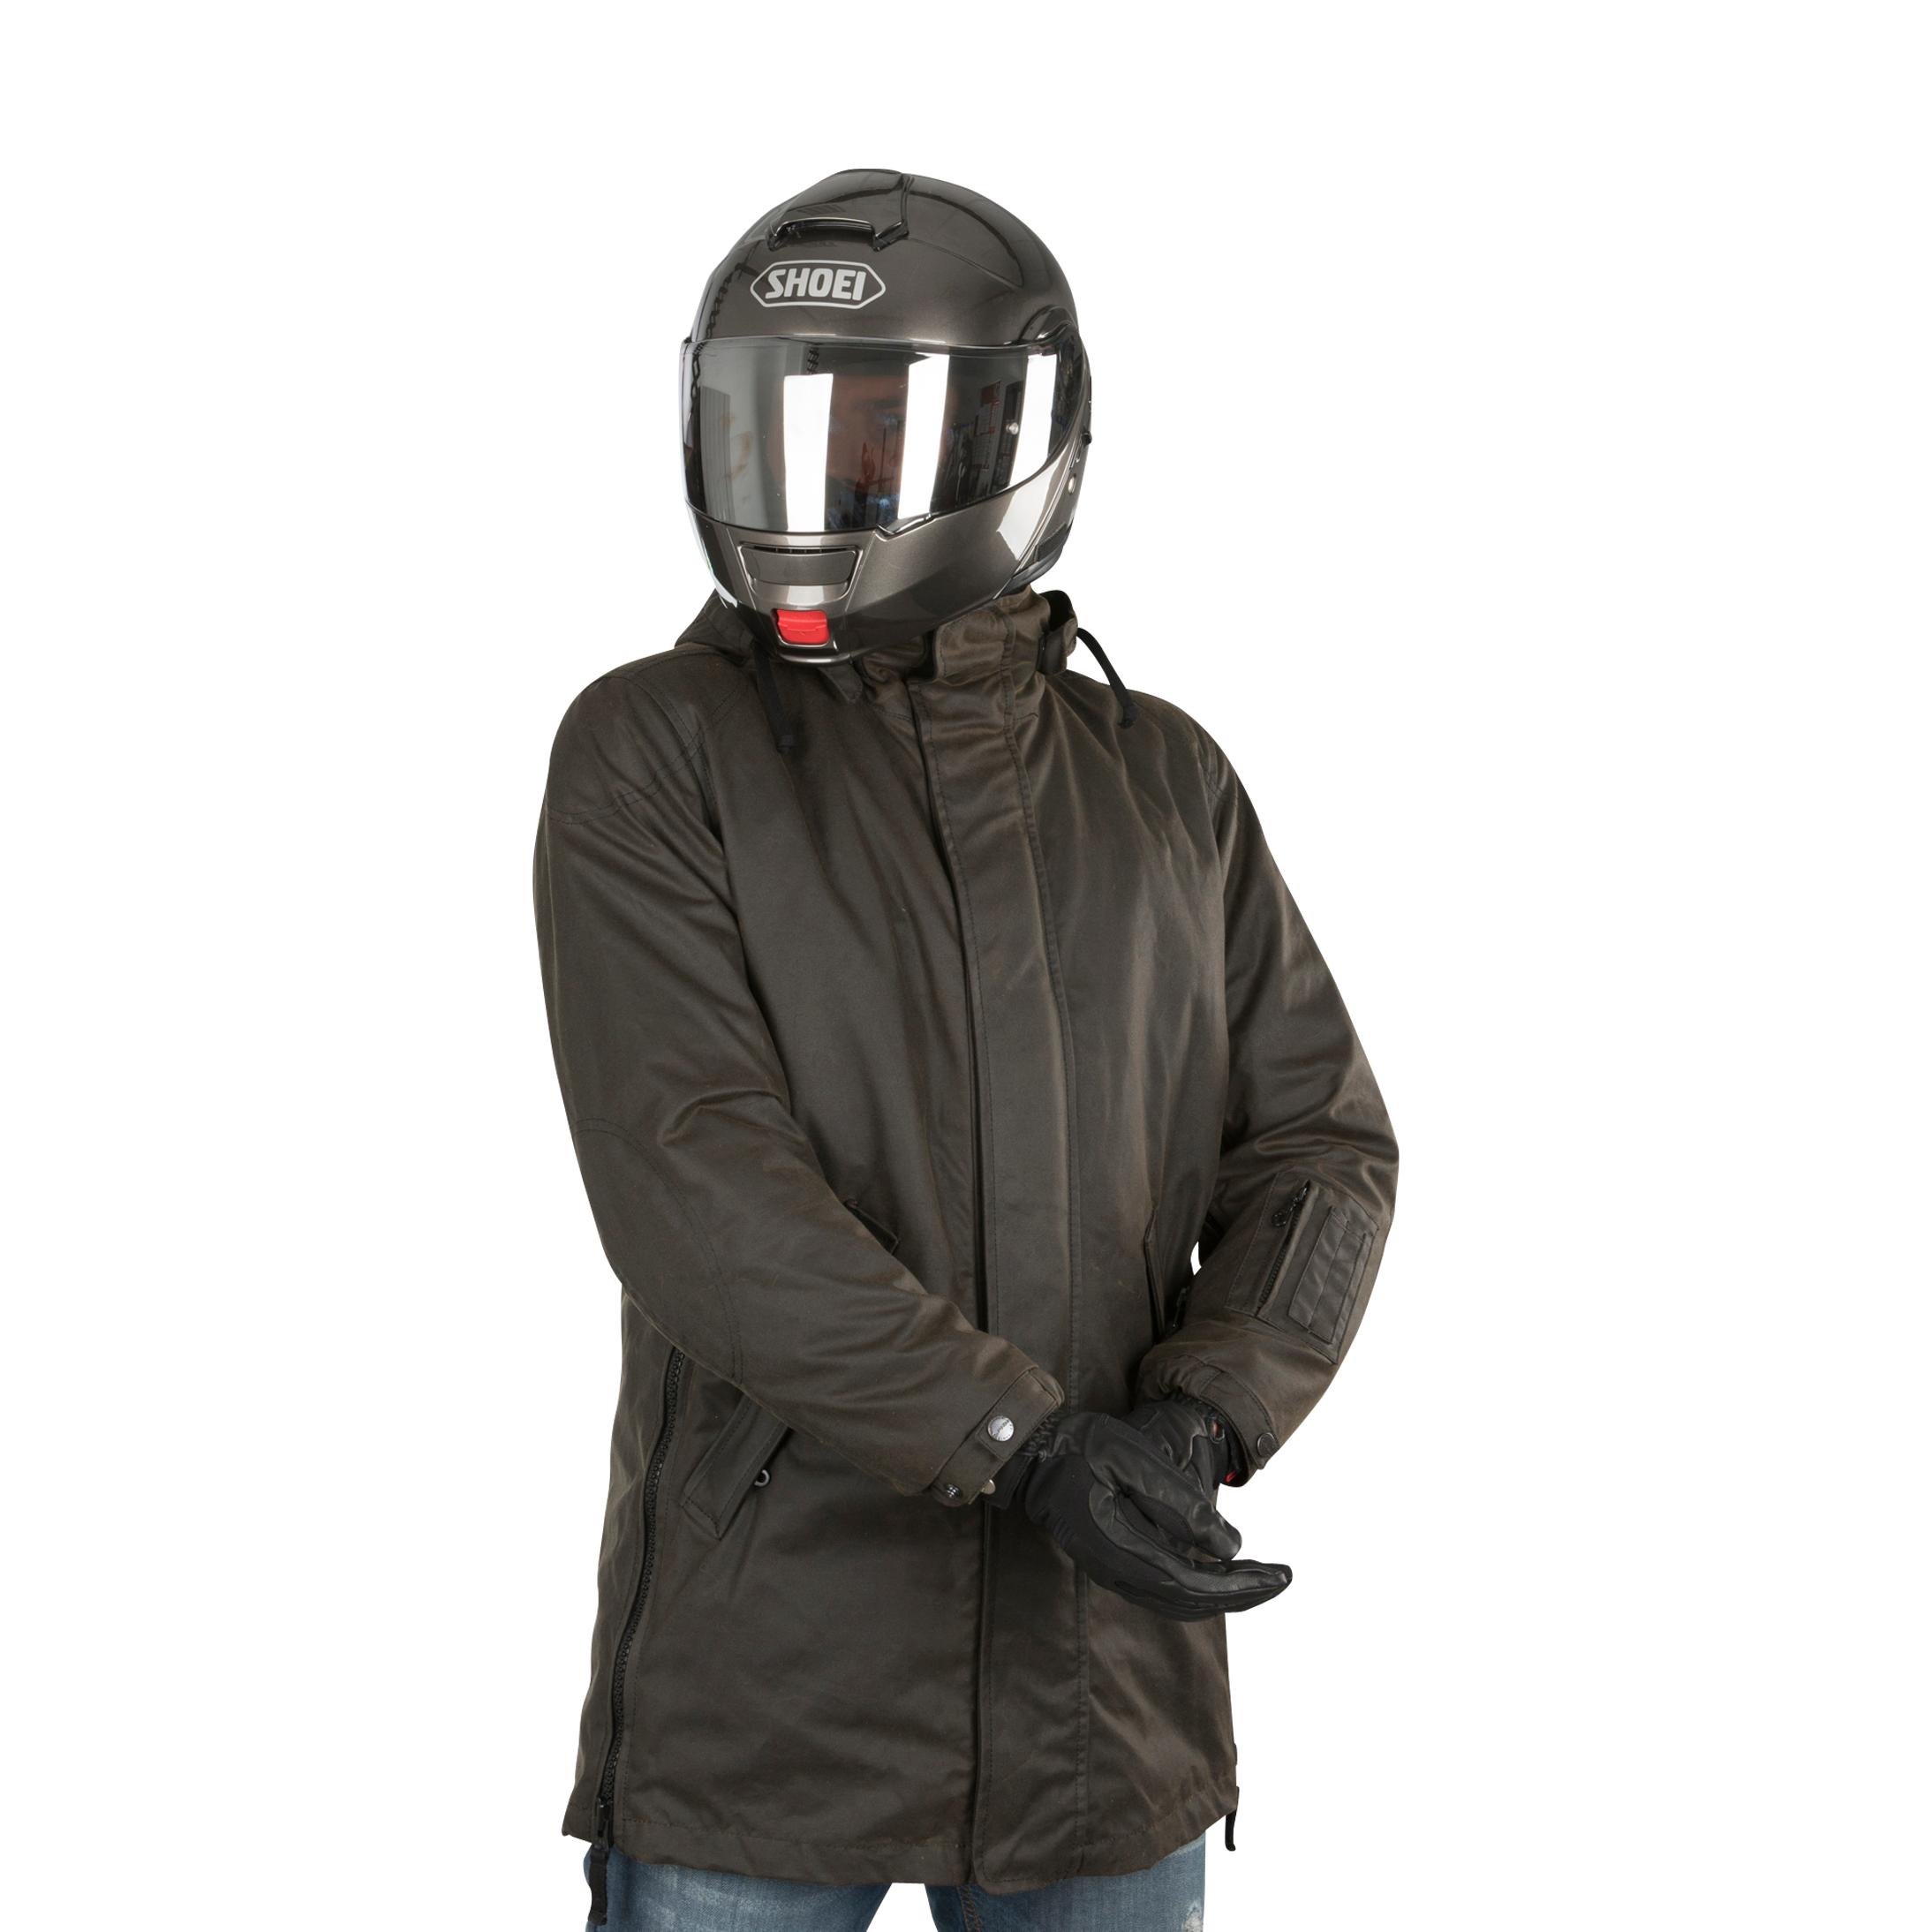 Spidi Veste Spidi Motocombat Wax Vert Foncé 2XL